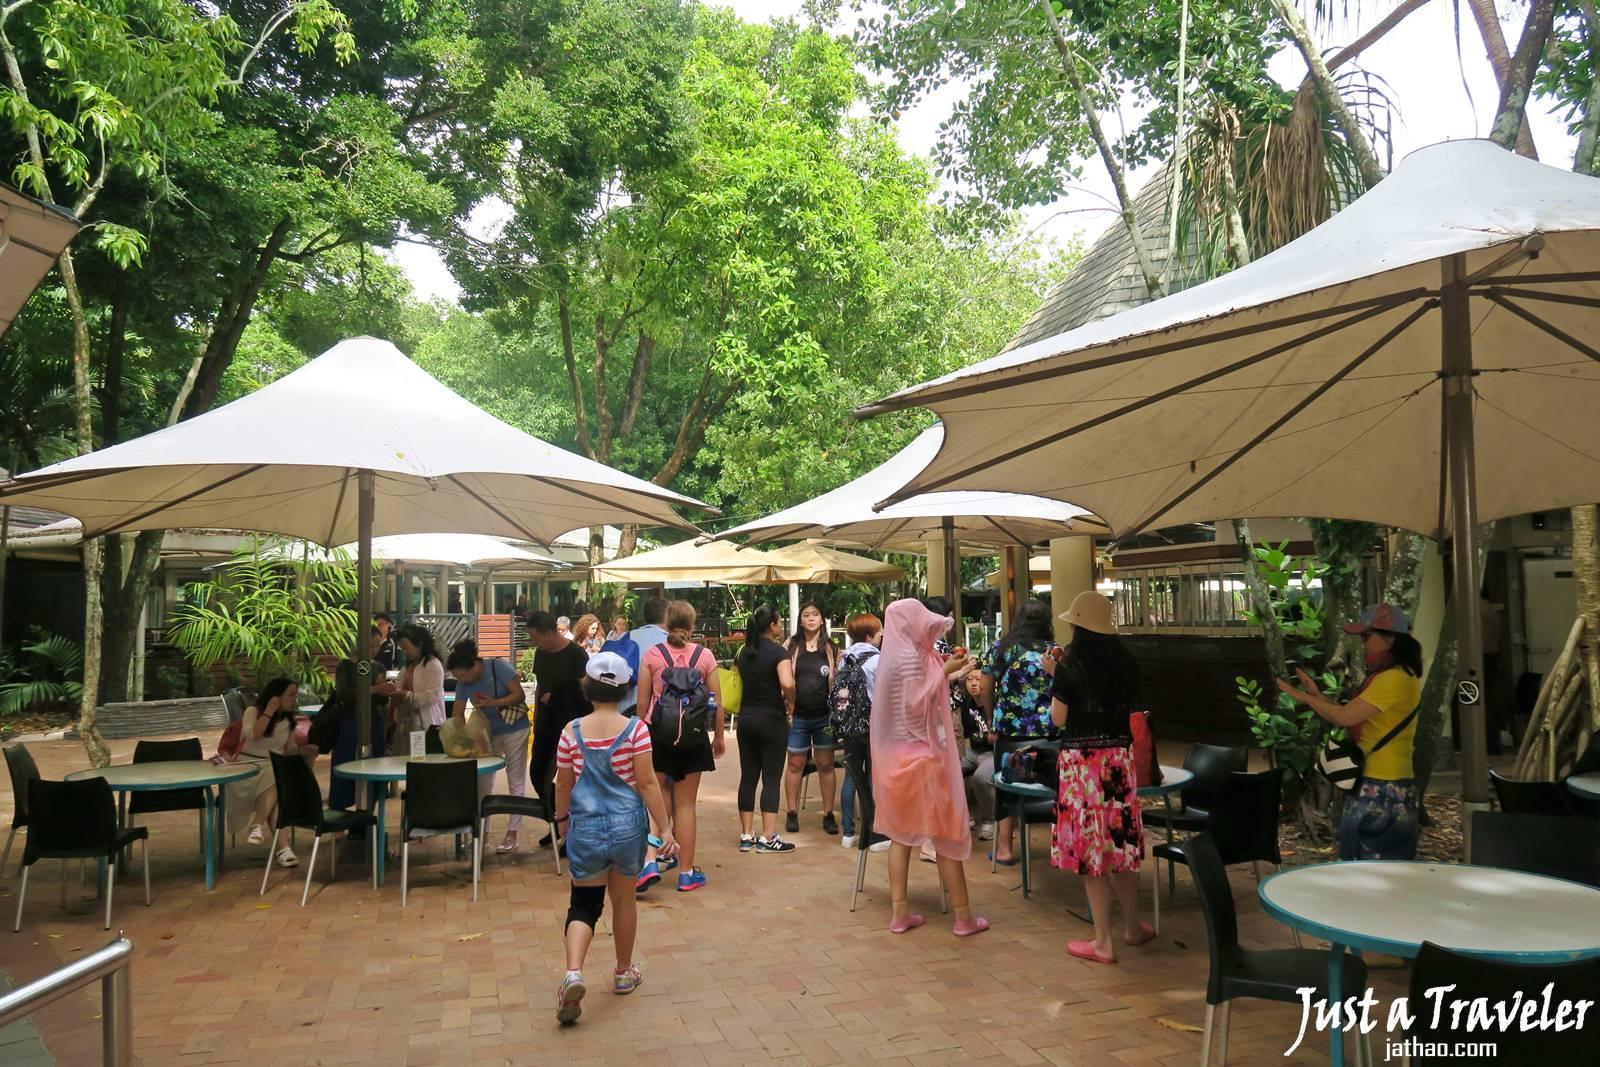 凱恩斯-大堡礁-綠島-度假村-內堡礁-推薦-旅遊-自由行-澳洲-Carins-Great-Barrier-Reef-Green-Island-Travel-Australia